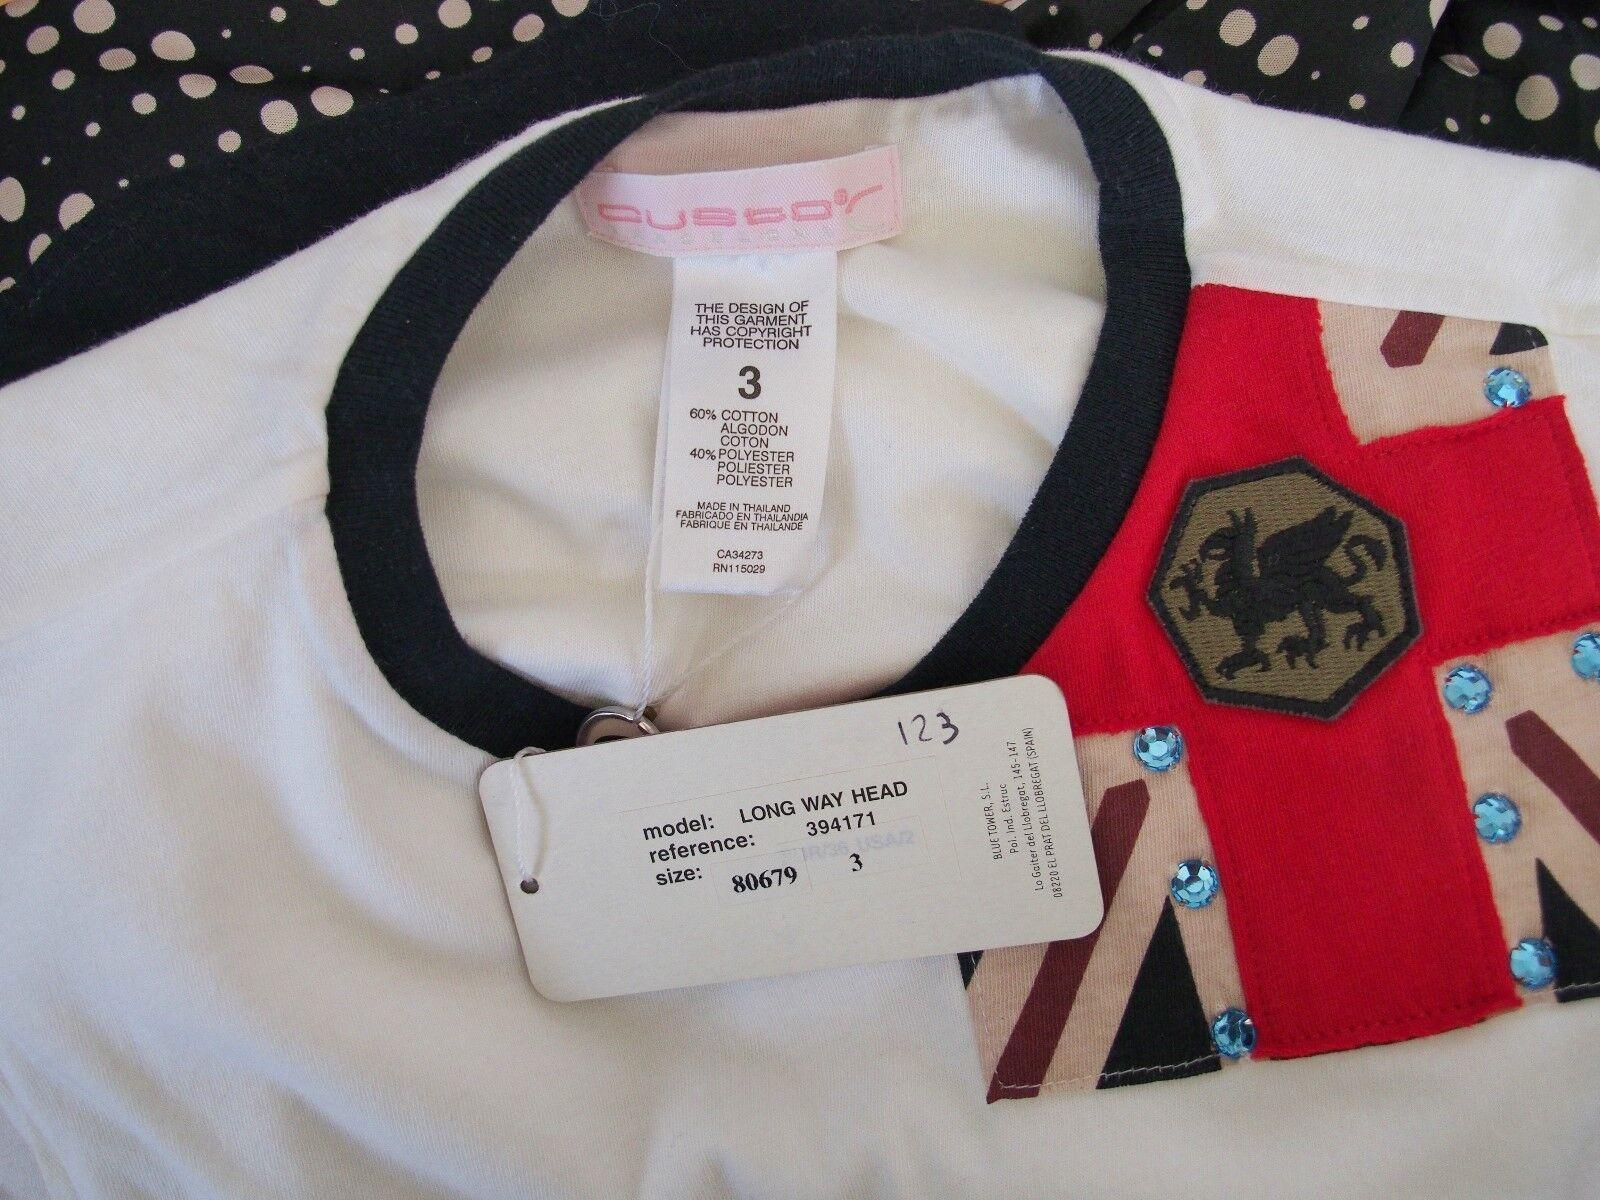 CUSTO CUSTO CUSTO BARCELONA Dress Size 3 US M 3efca3